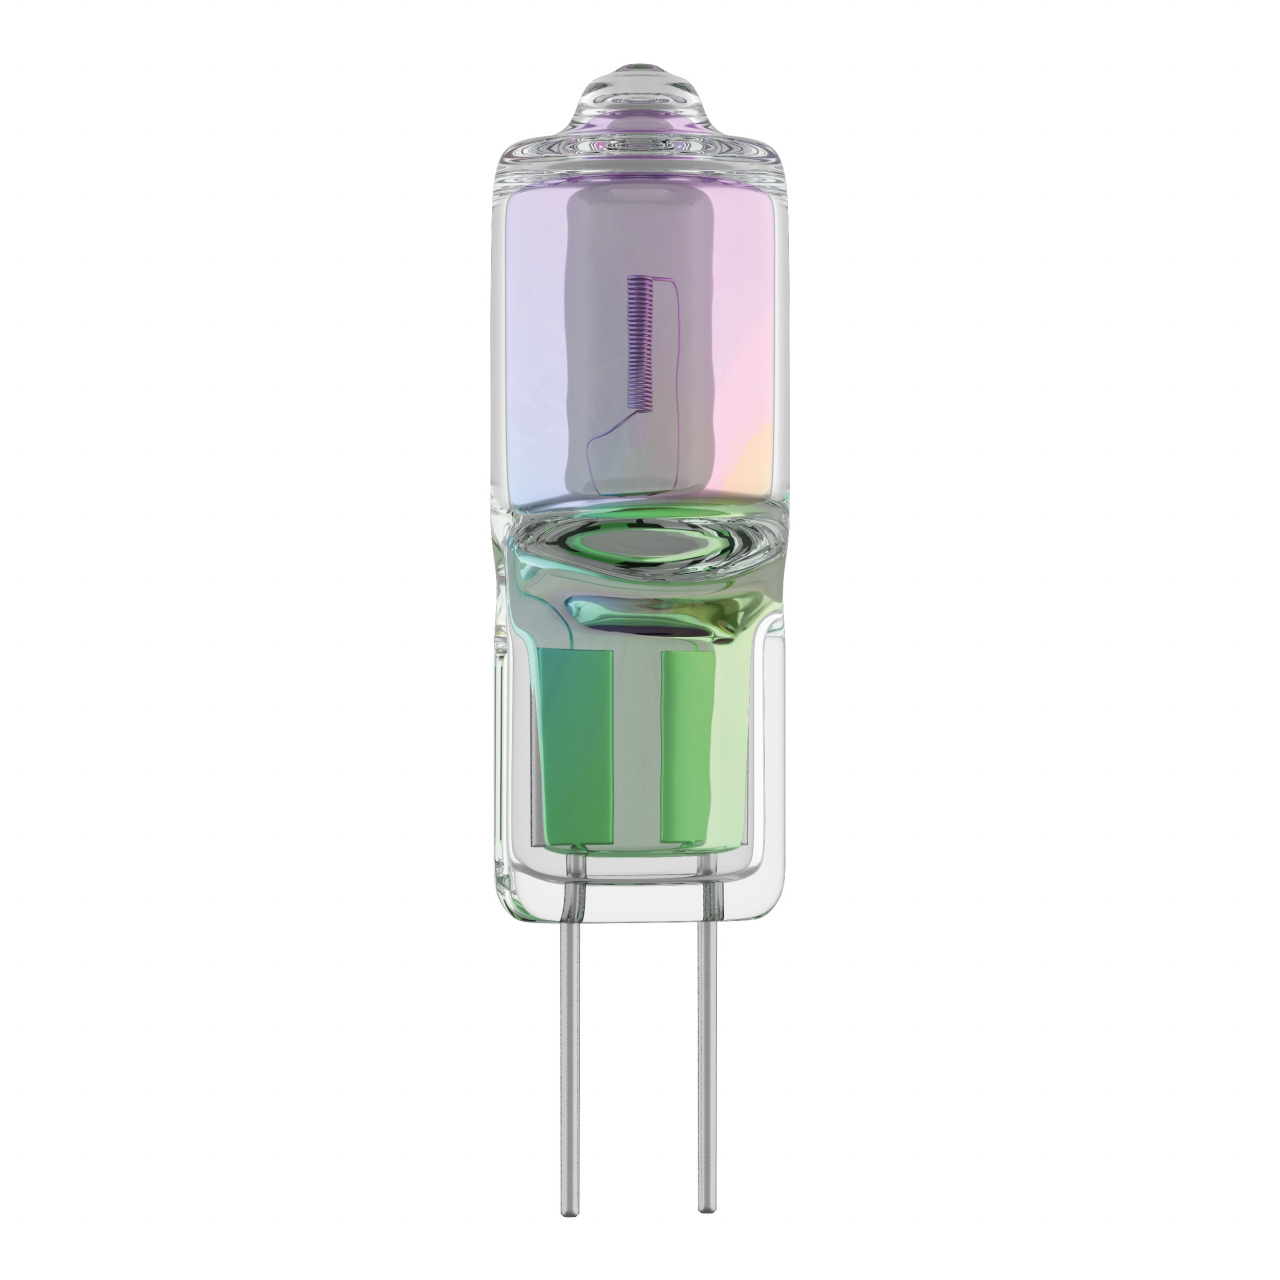 Лампа HAL 12V JC G4 35W RA100 2800K 2000H DIMM Lightstar 921025